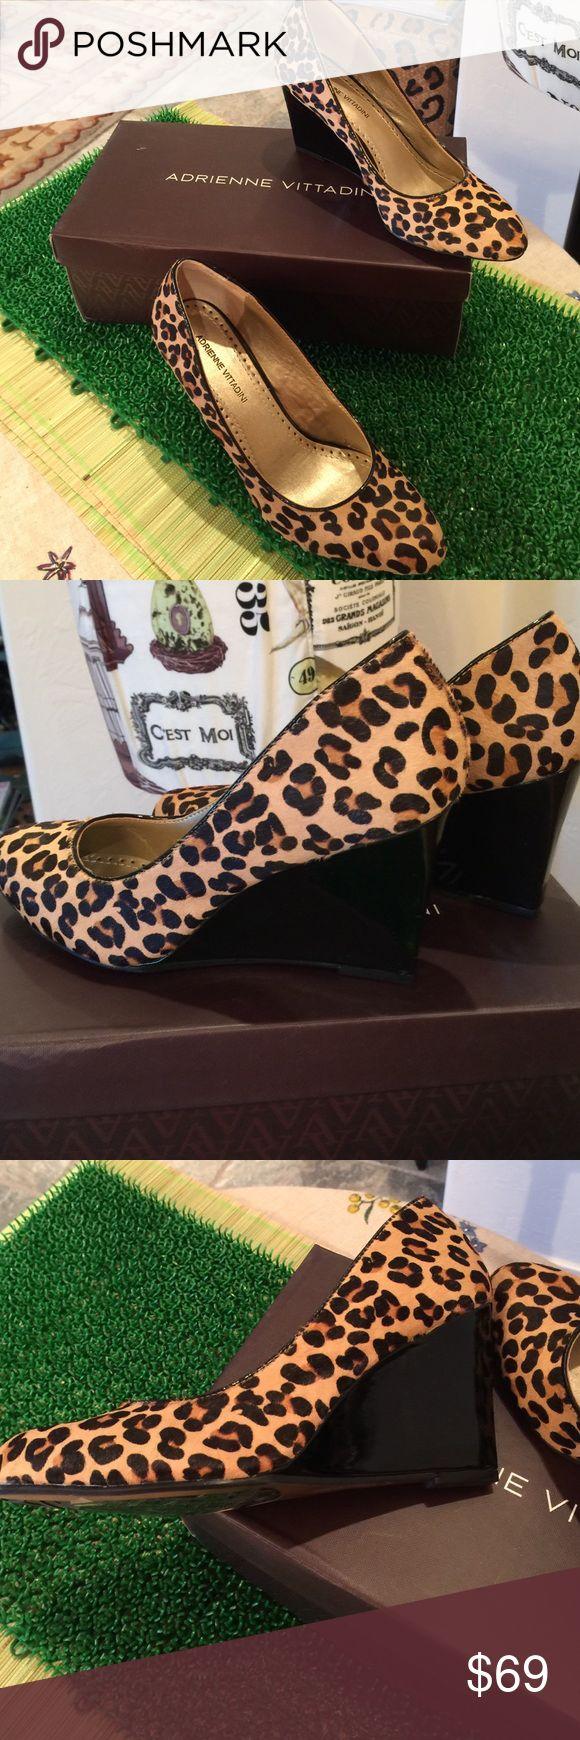 "Leopard Wedges Adrienne Vittadini NWT Adrienne Vittadini Calf Skin Leopard Wedges, Leather lined, 3"" Wedges Adrienne Vittadini Shoes Platforms"